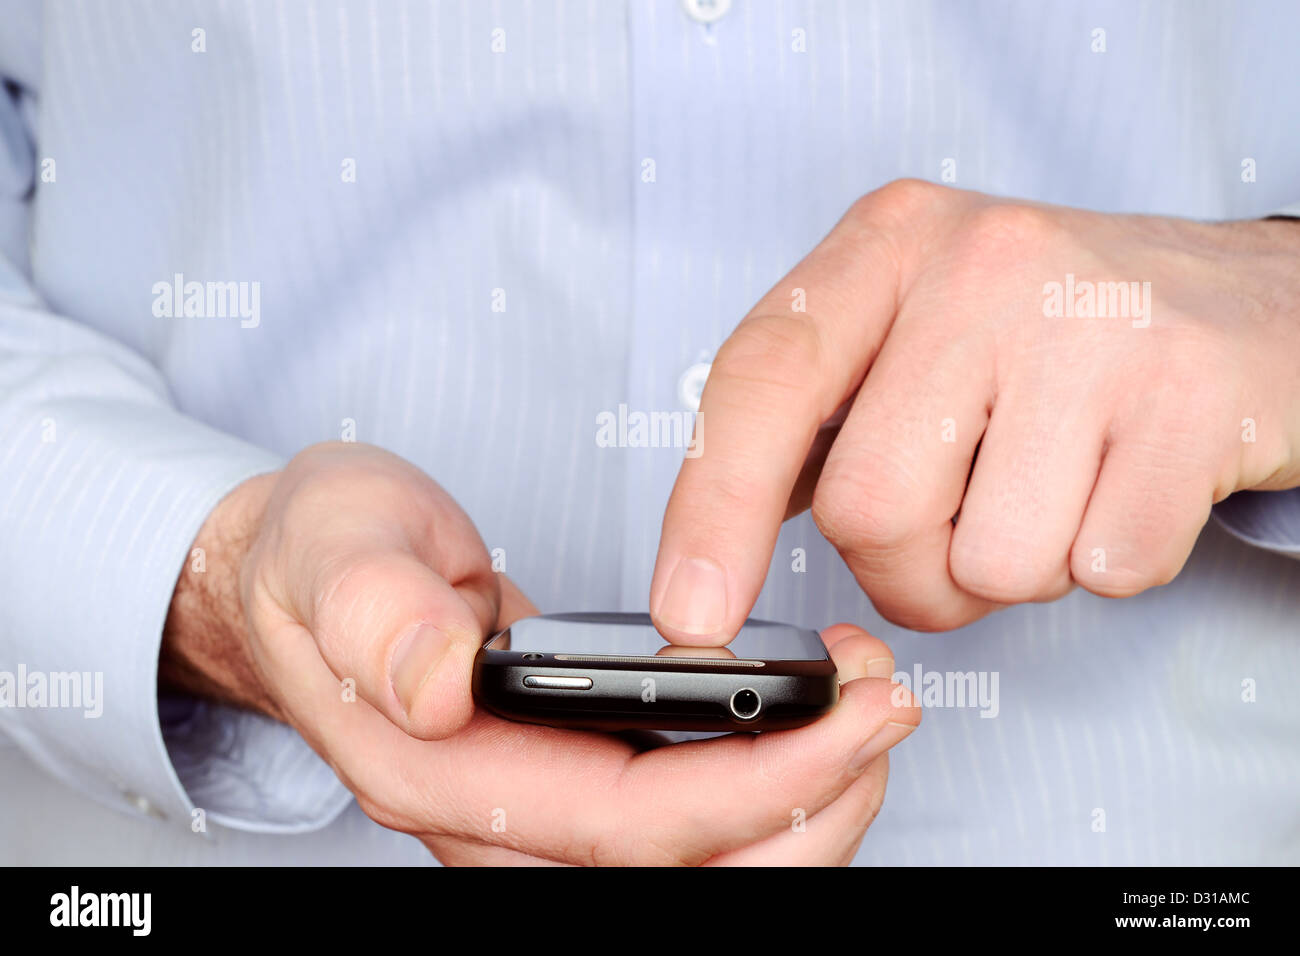 Man Using a Smartphone, Close Up. - Stock Image